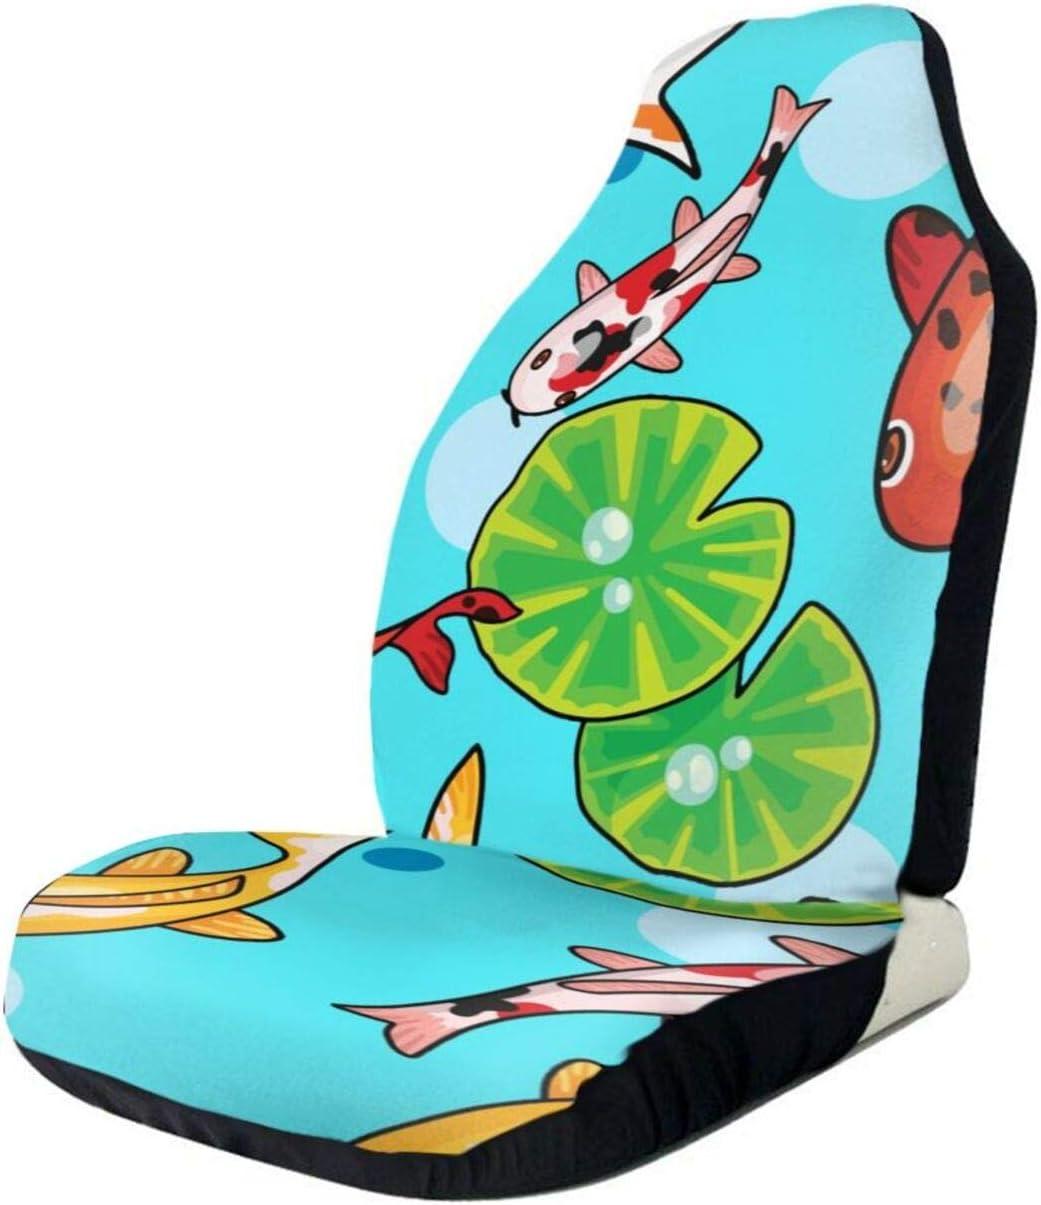 RUTO Goldfish Car Seat Covers Long Beach Mall Set Atlanta Mall Vehi Most Off-Road Suvs Cars